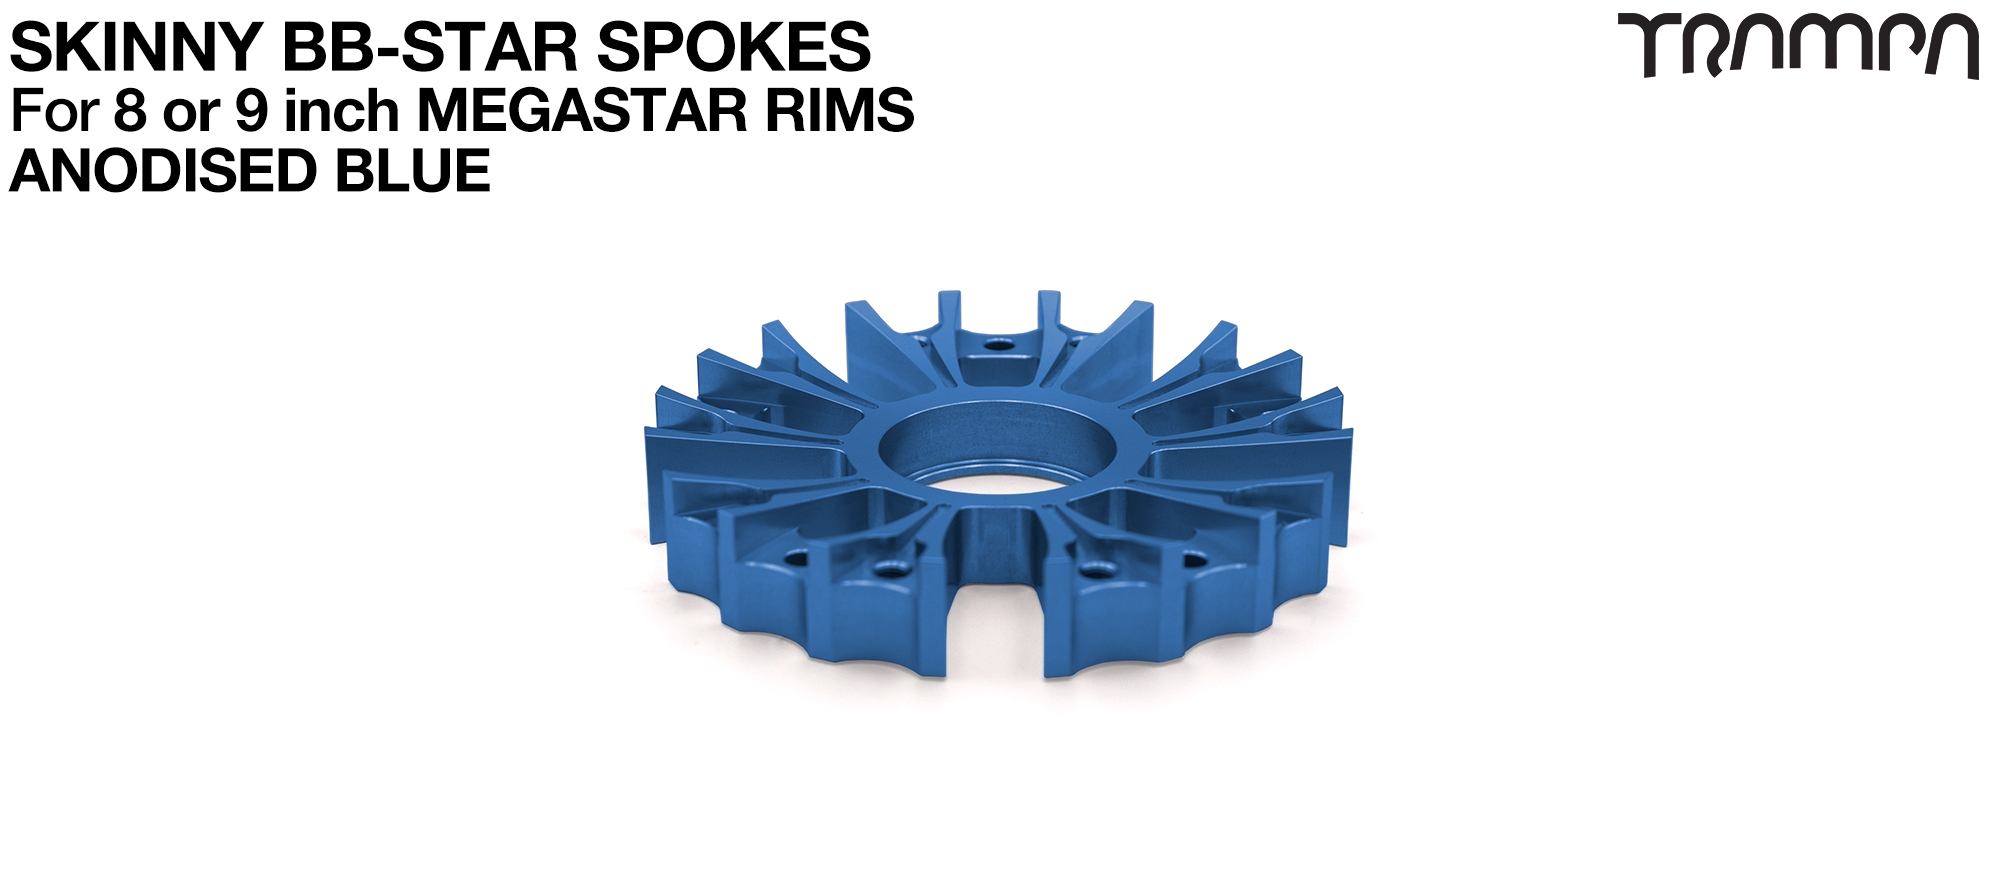 BB Star Spoke for 8 Inch DEEP-DISH MEGASTAR Rim - CNC Precision milled - BLUE